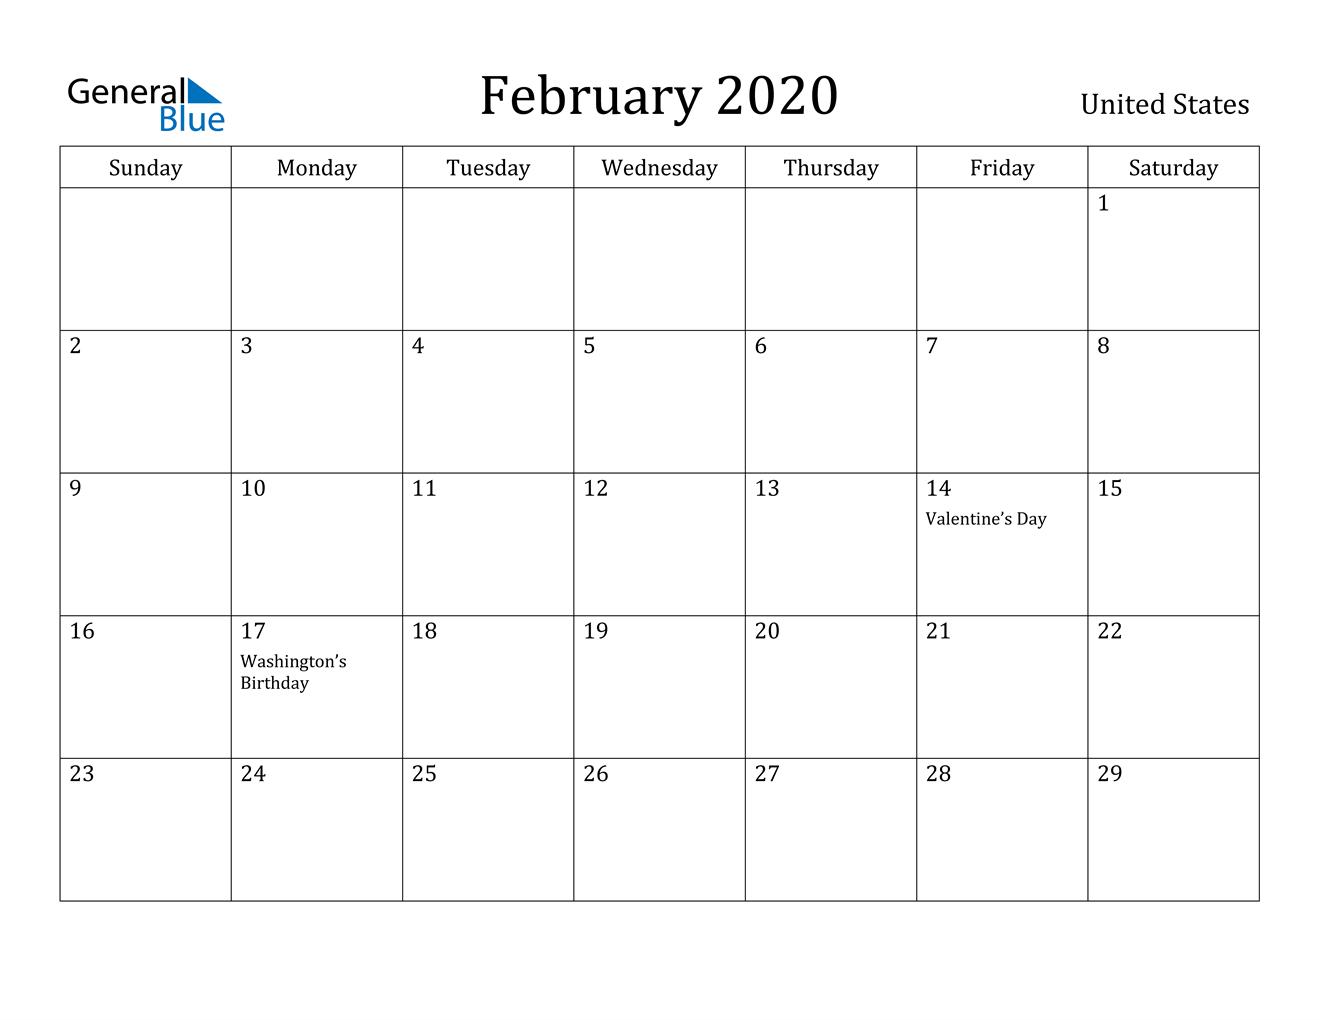 February 2020 Calendar - United States